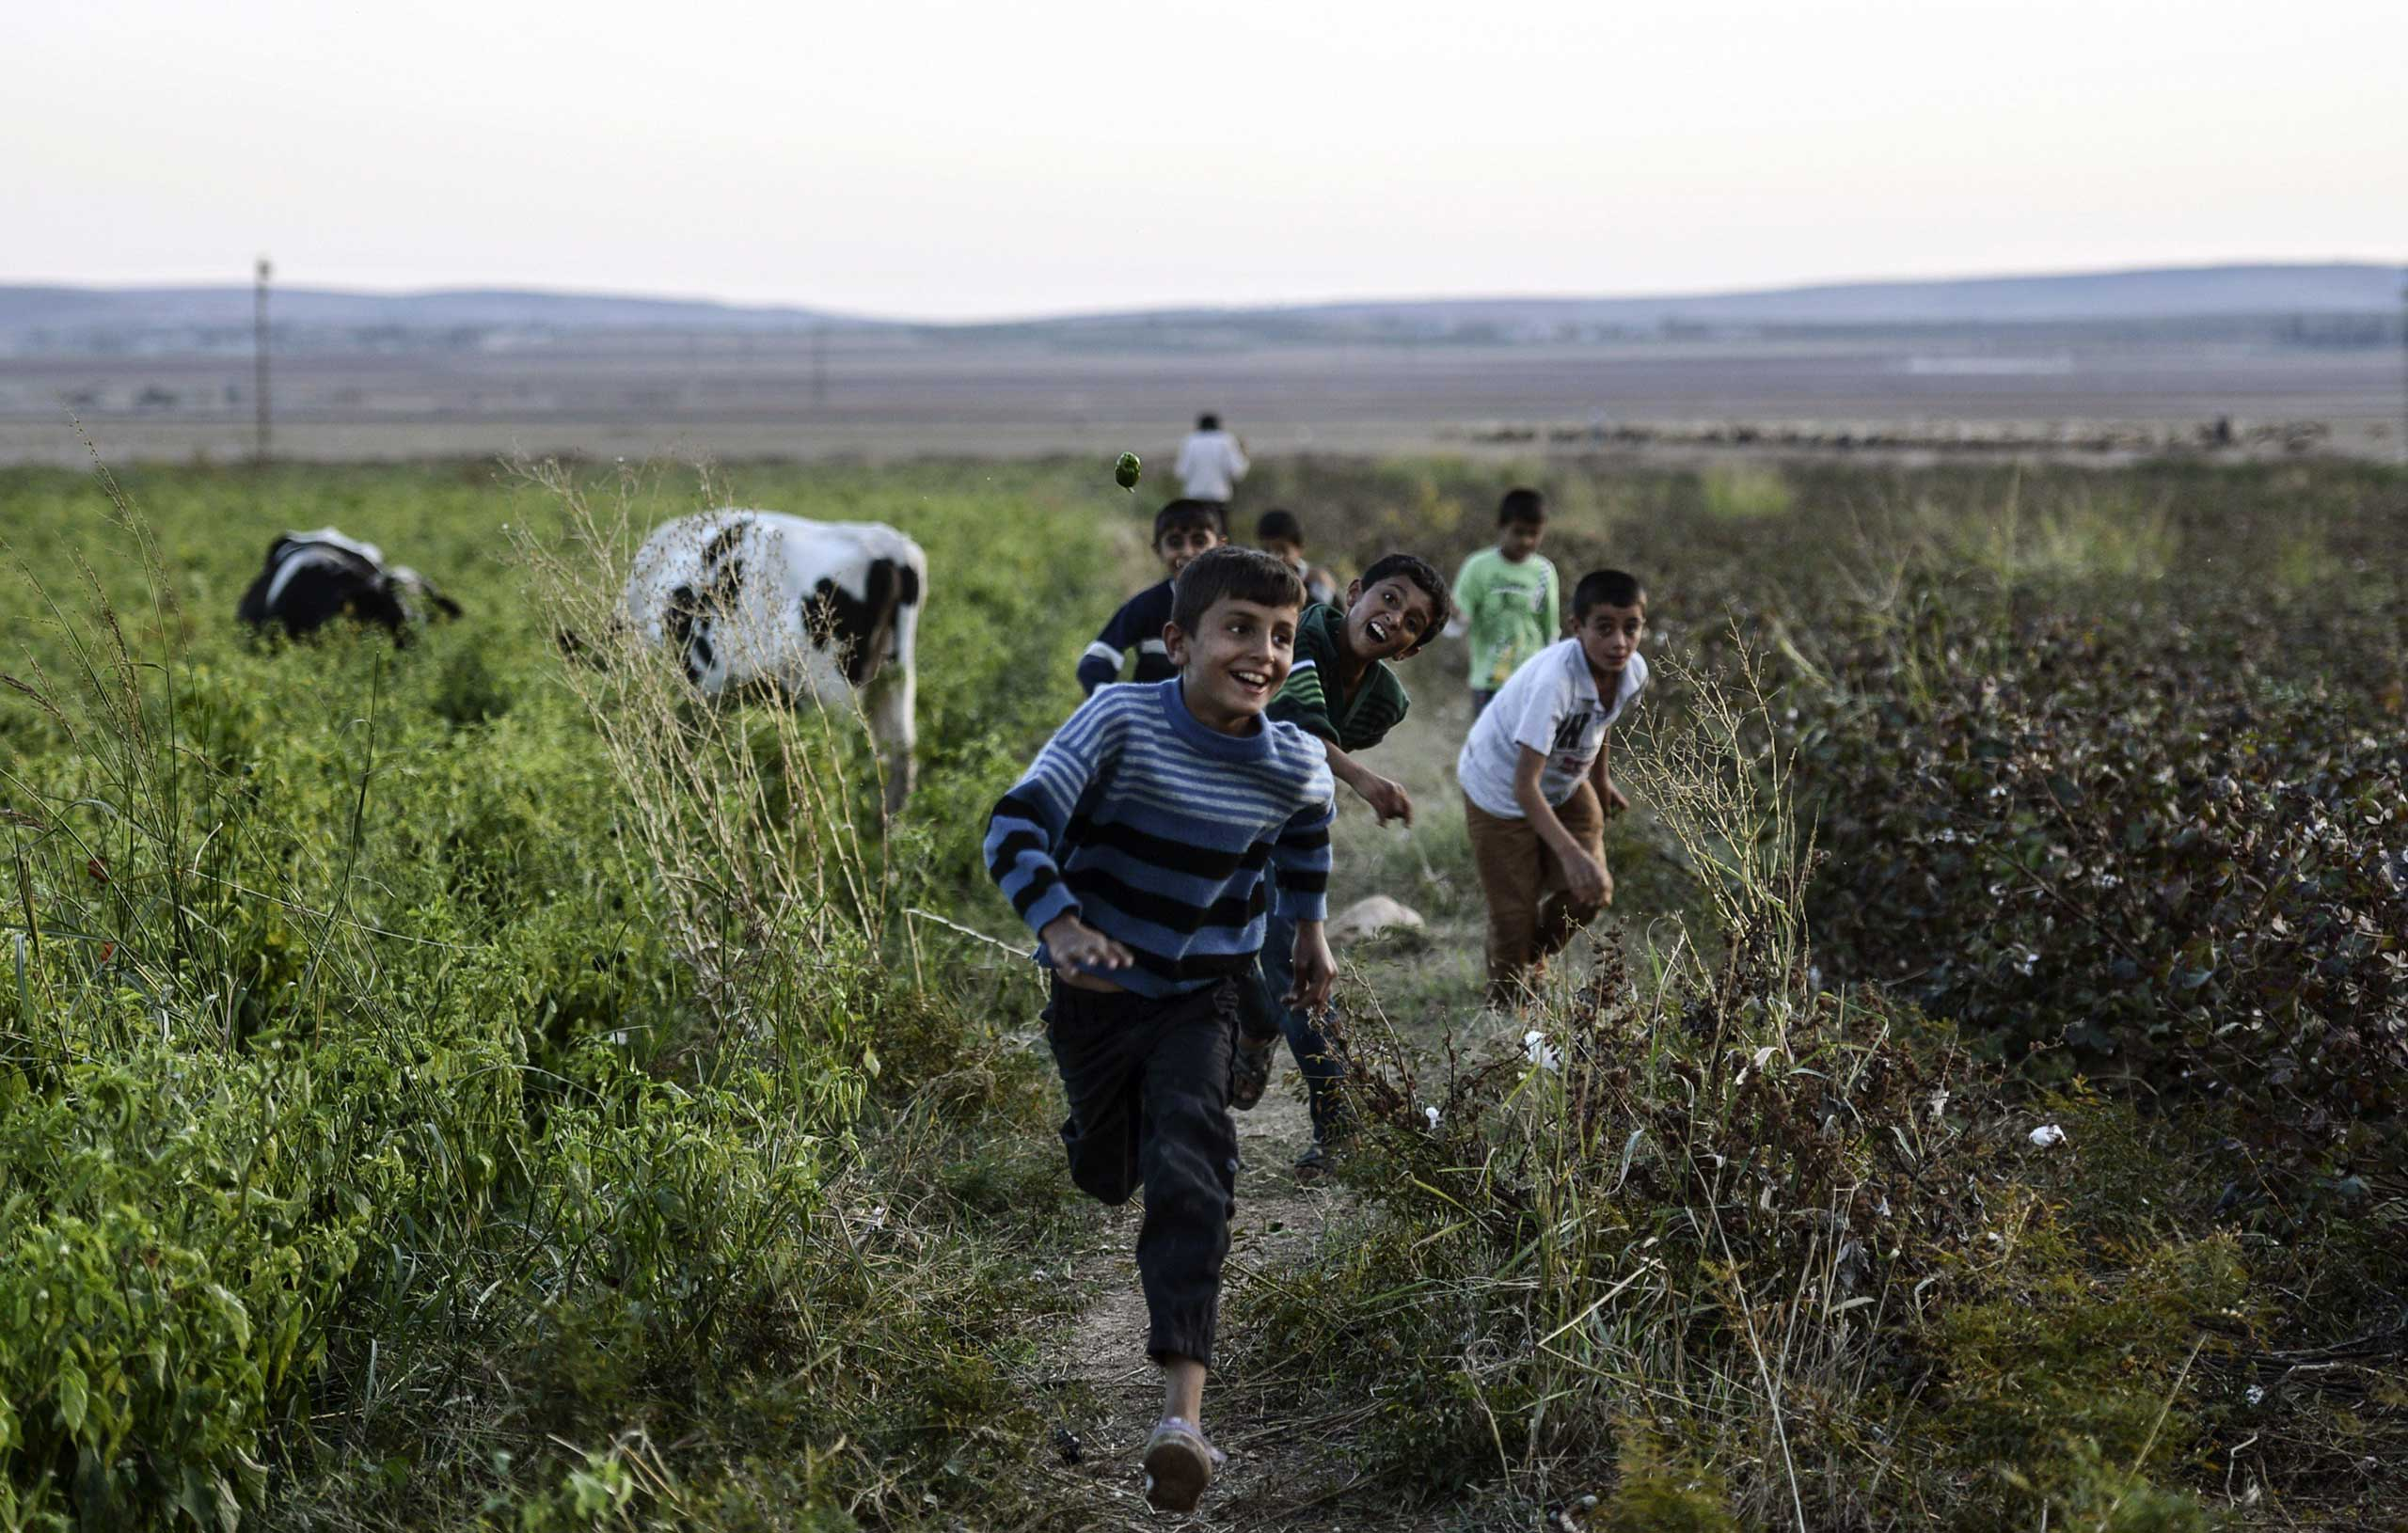 Oct. 25, 2014. Kurdish boys play in a field near the Syrian border at the southeastern village of Yumurtalik, Sanliurfa province, Turkey.